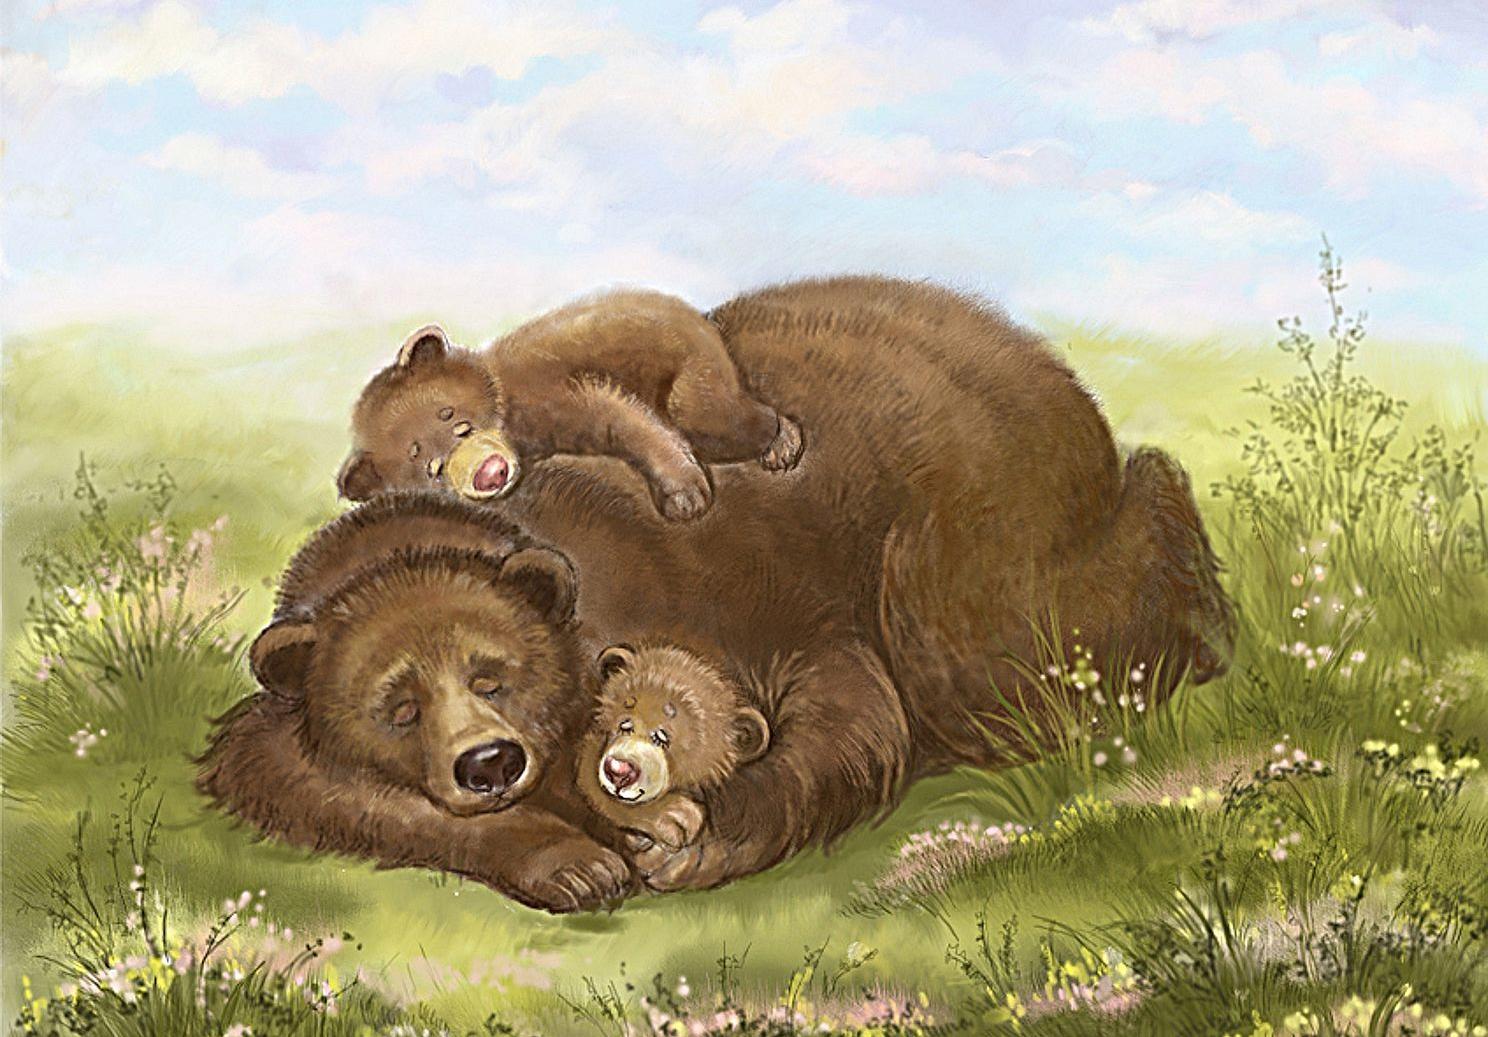 сдачи экзаменов картинки медведица и три медвежонка дизайн логотипа